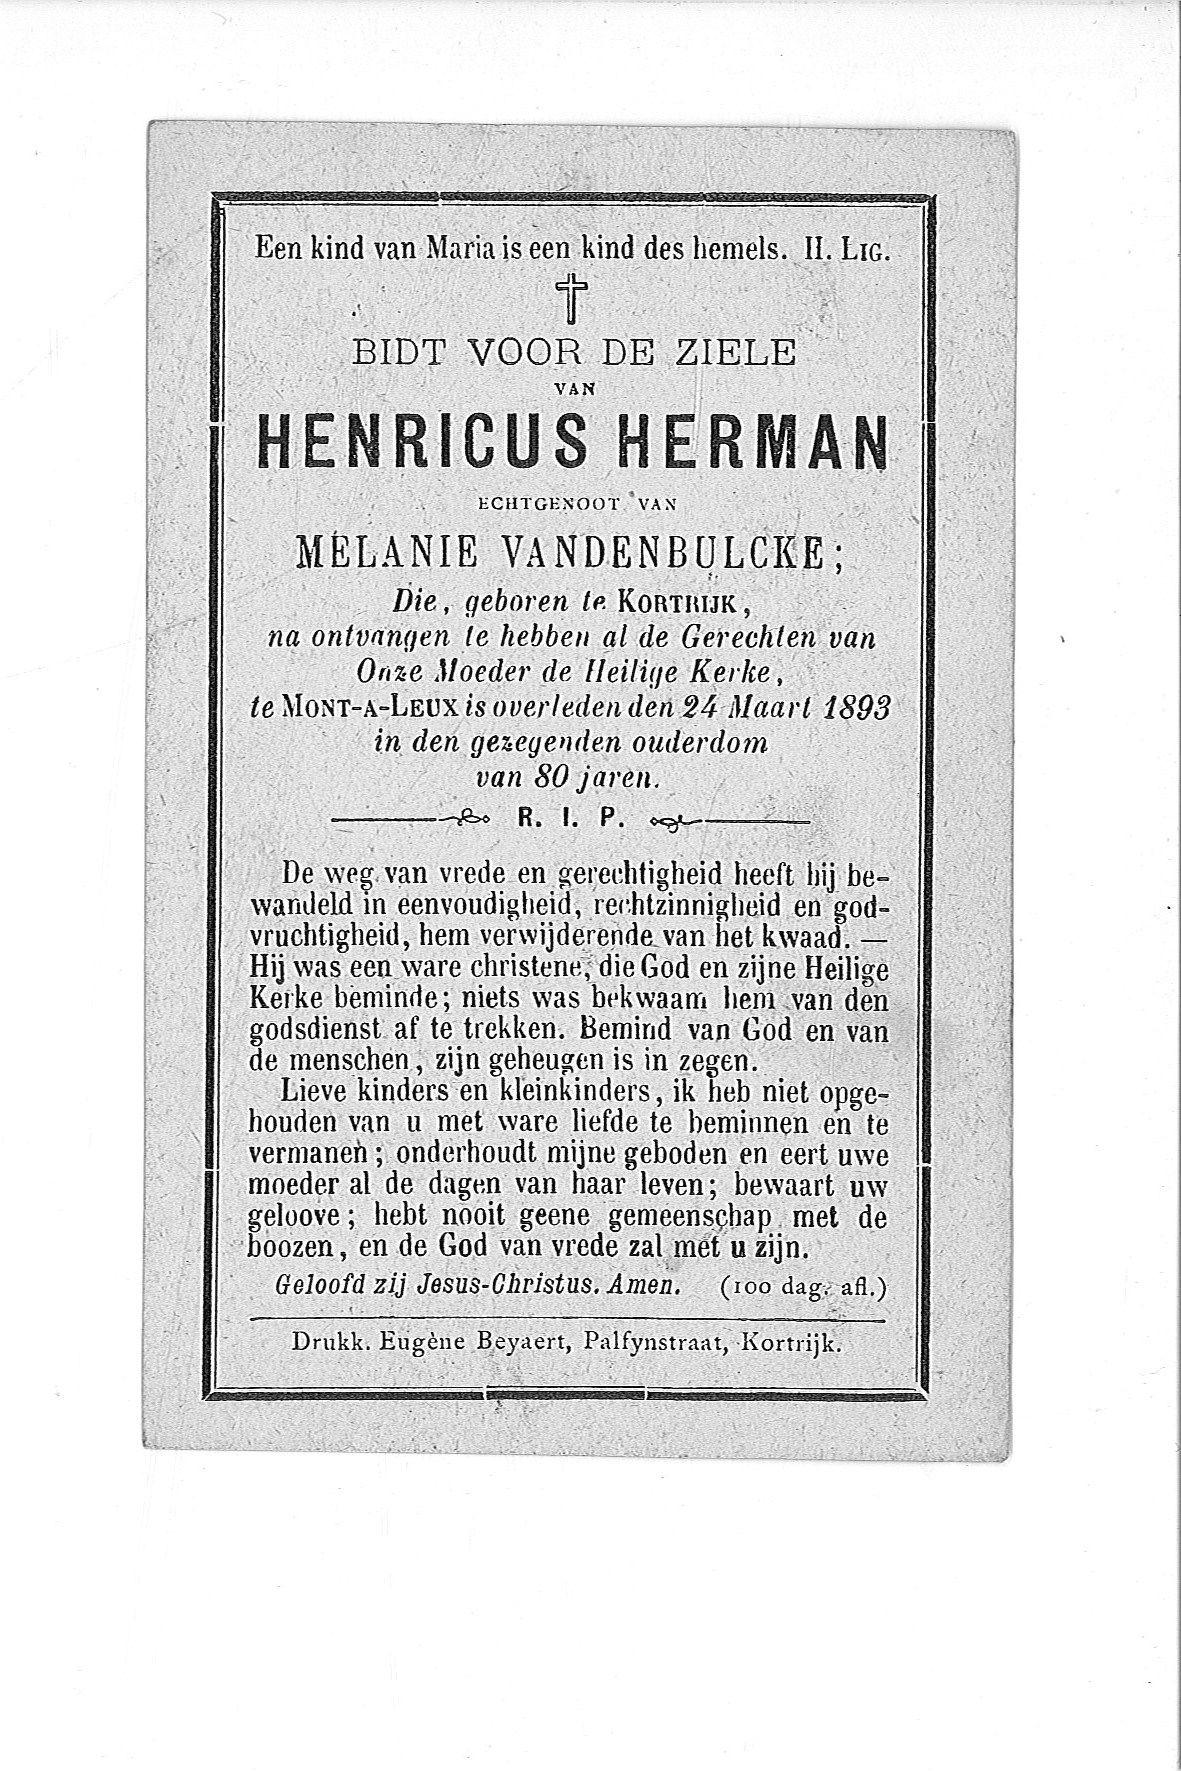 henricus(1893)20090427133825_00032.jpg